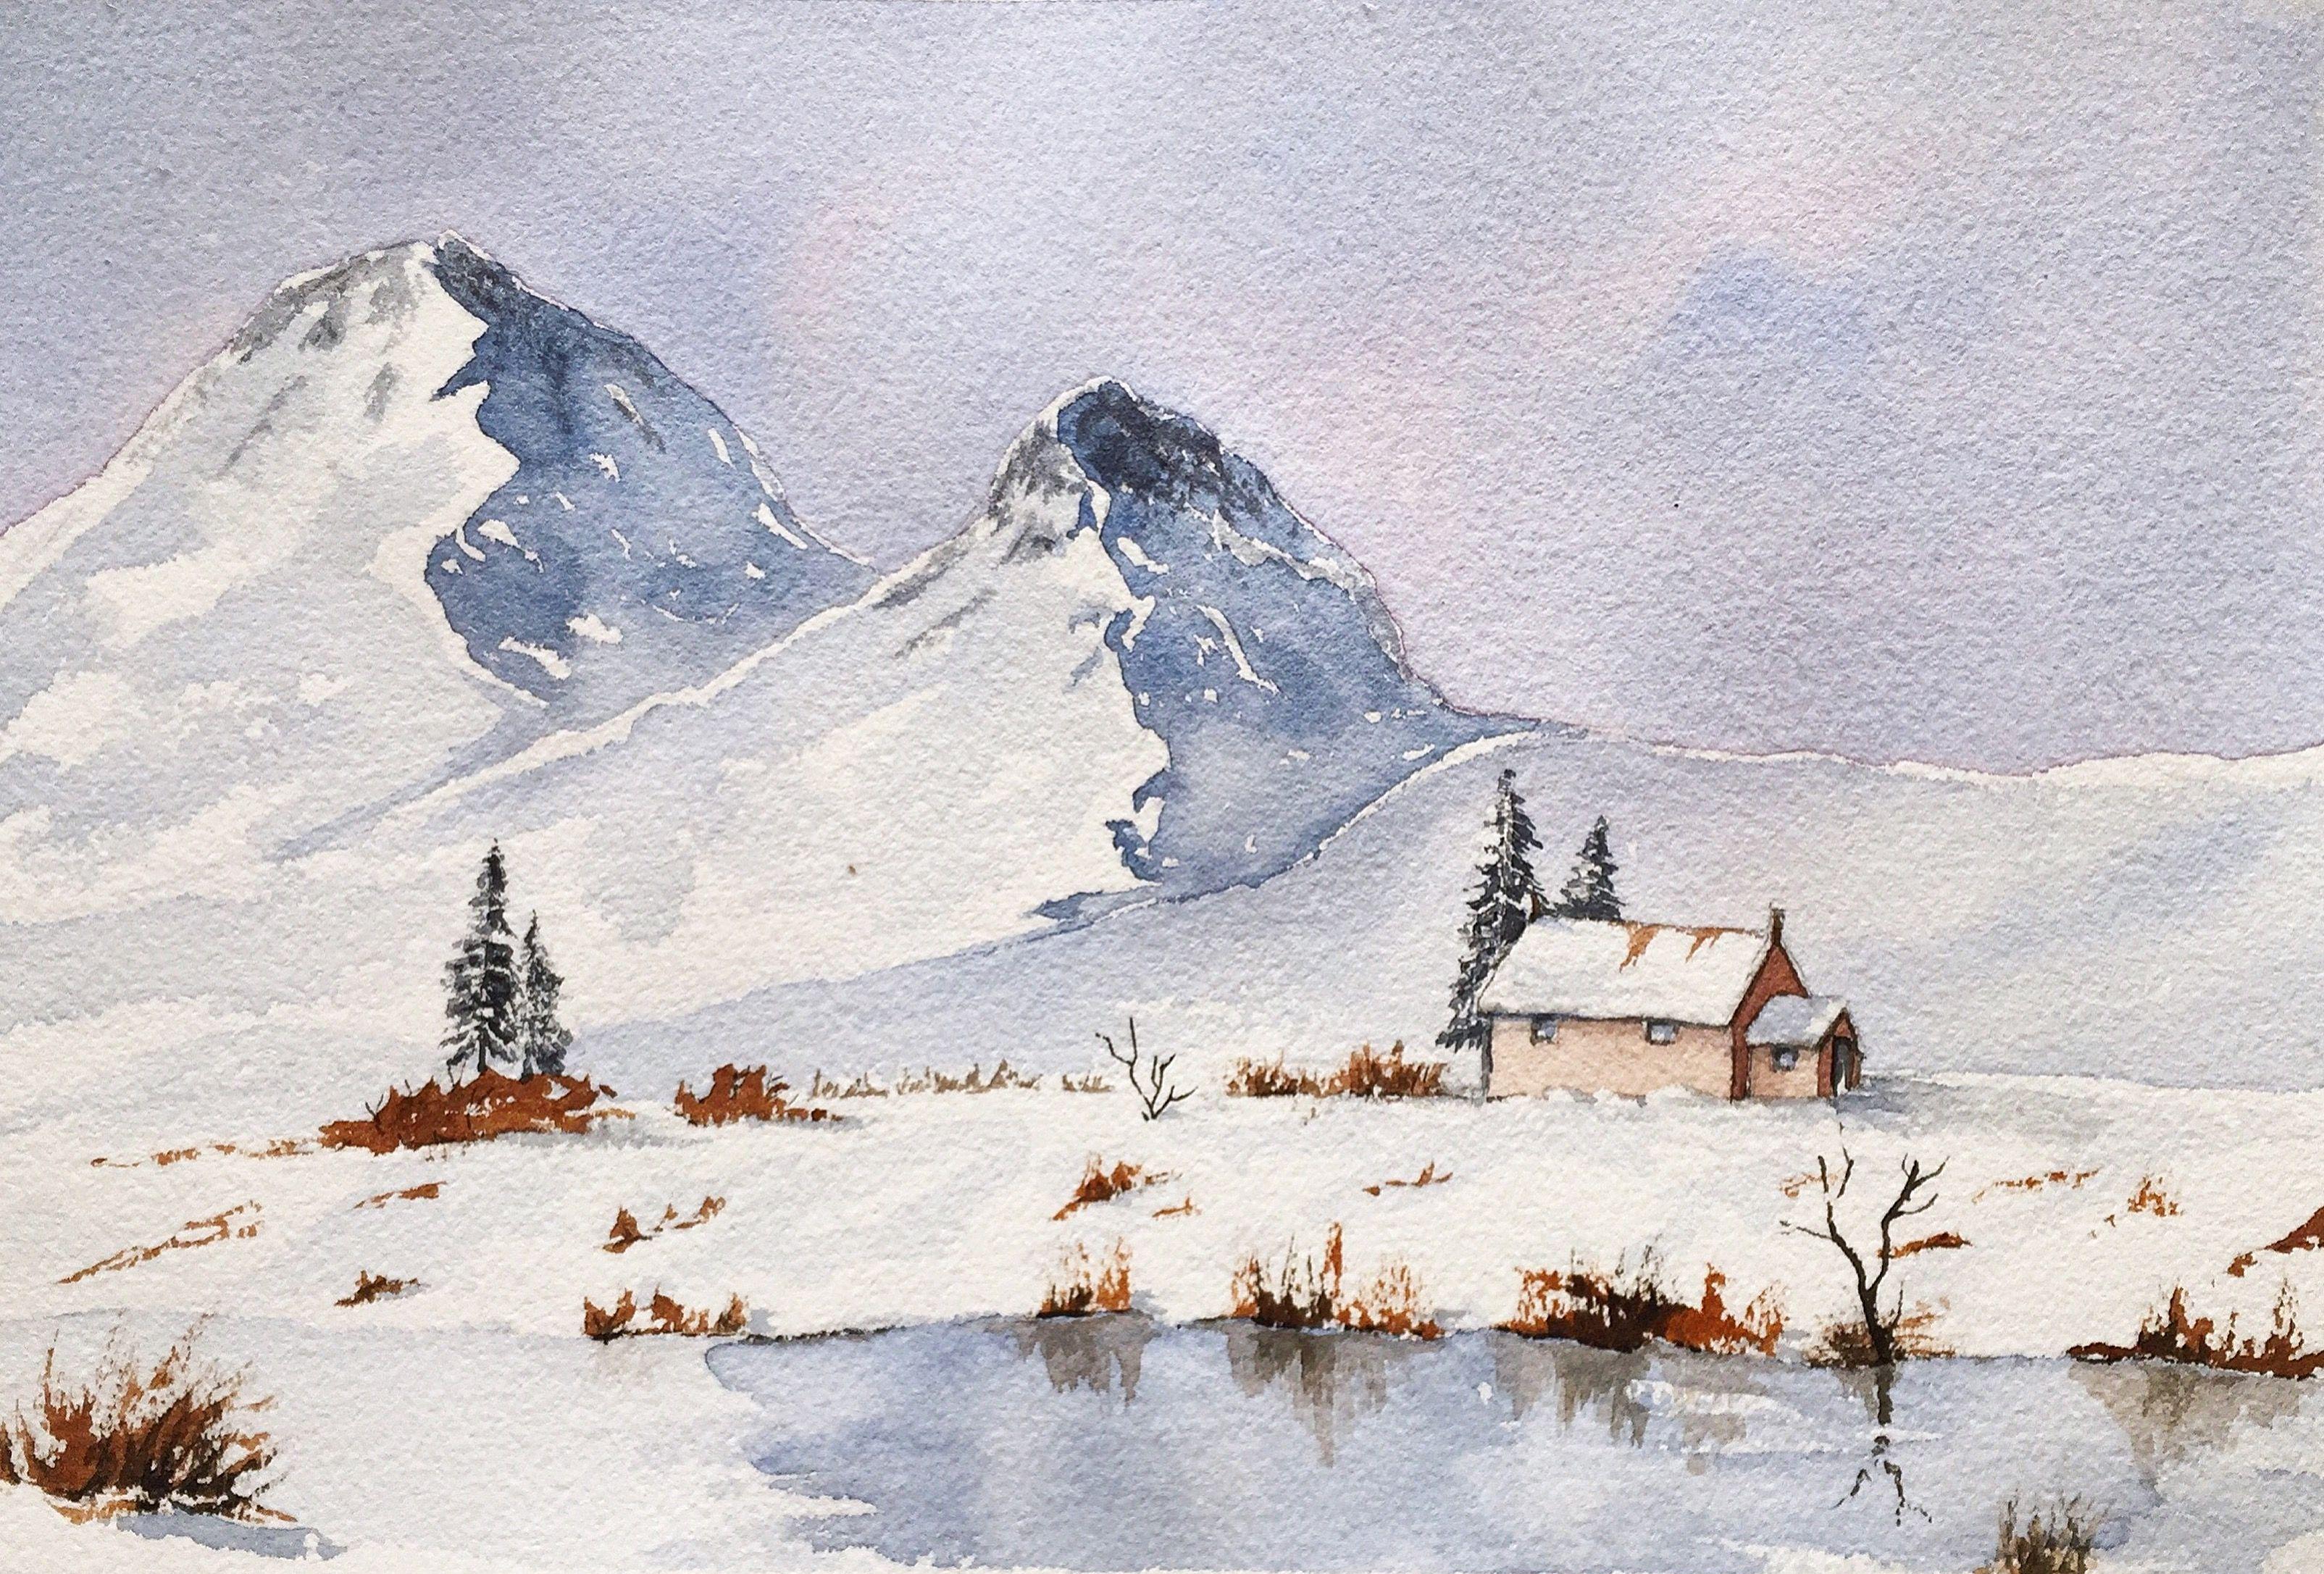 Snow Mountain Watercolor Aquarel Aquarel Les Schilder